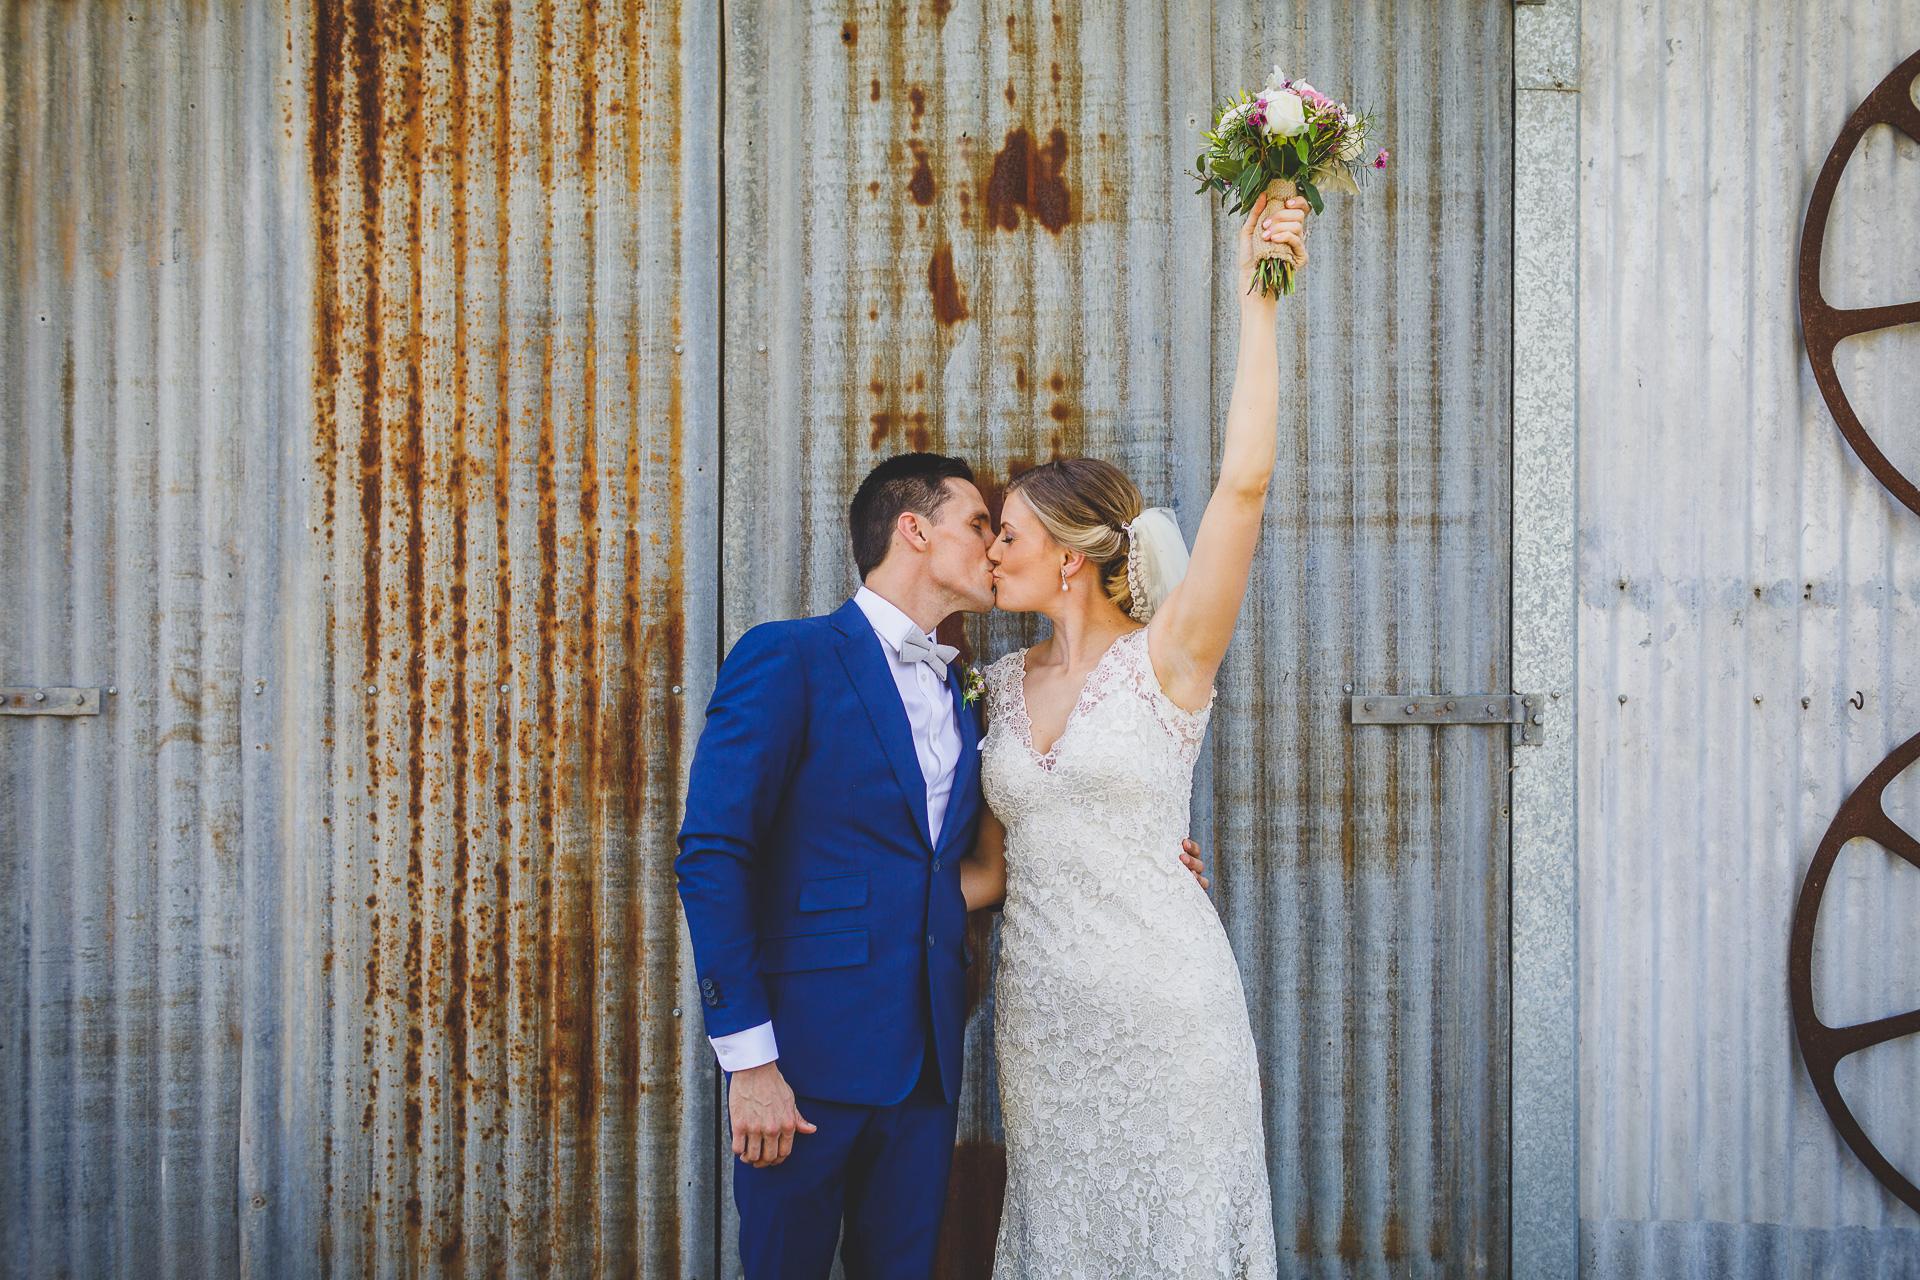 20161112 - Heath_Ruth_Wombat_Hollow_Wedding | 313.jpg